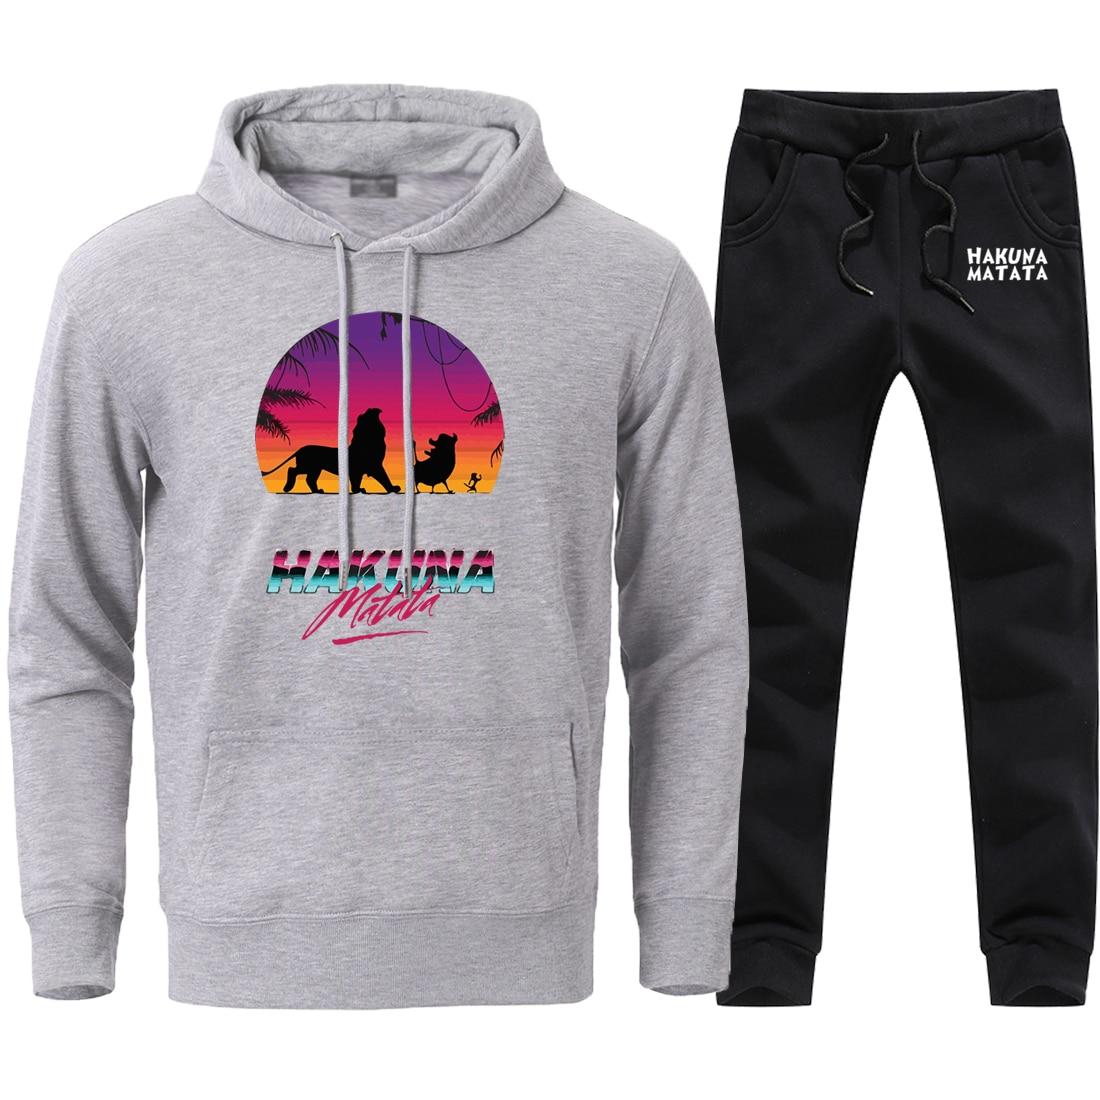 Fashion Hakuna Matata Pullover Sweatshirts Mens Loose Pants Sets 2 Pieces 2020 Male Brand High Quality Hooded Sweatpants Suits